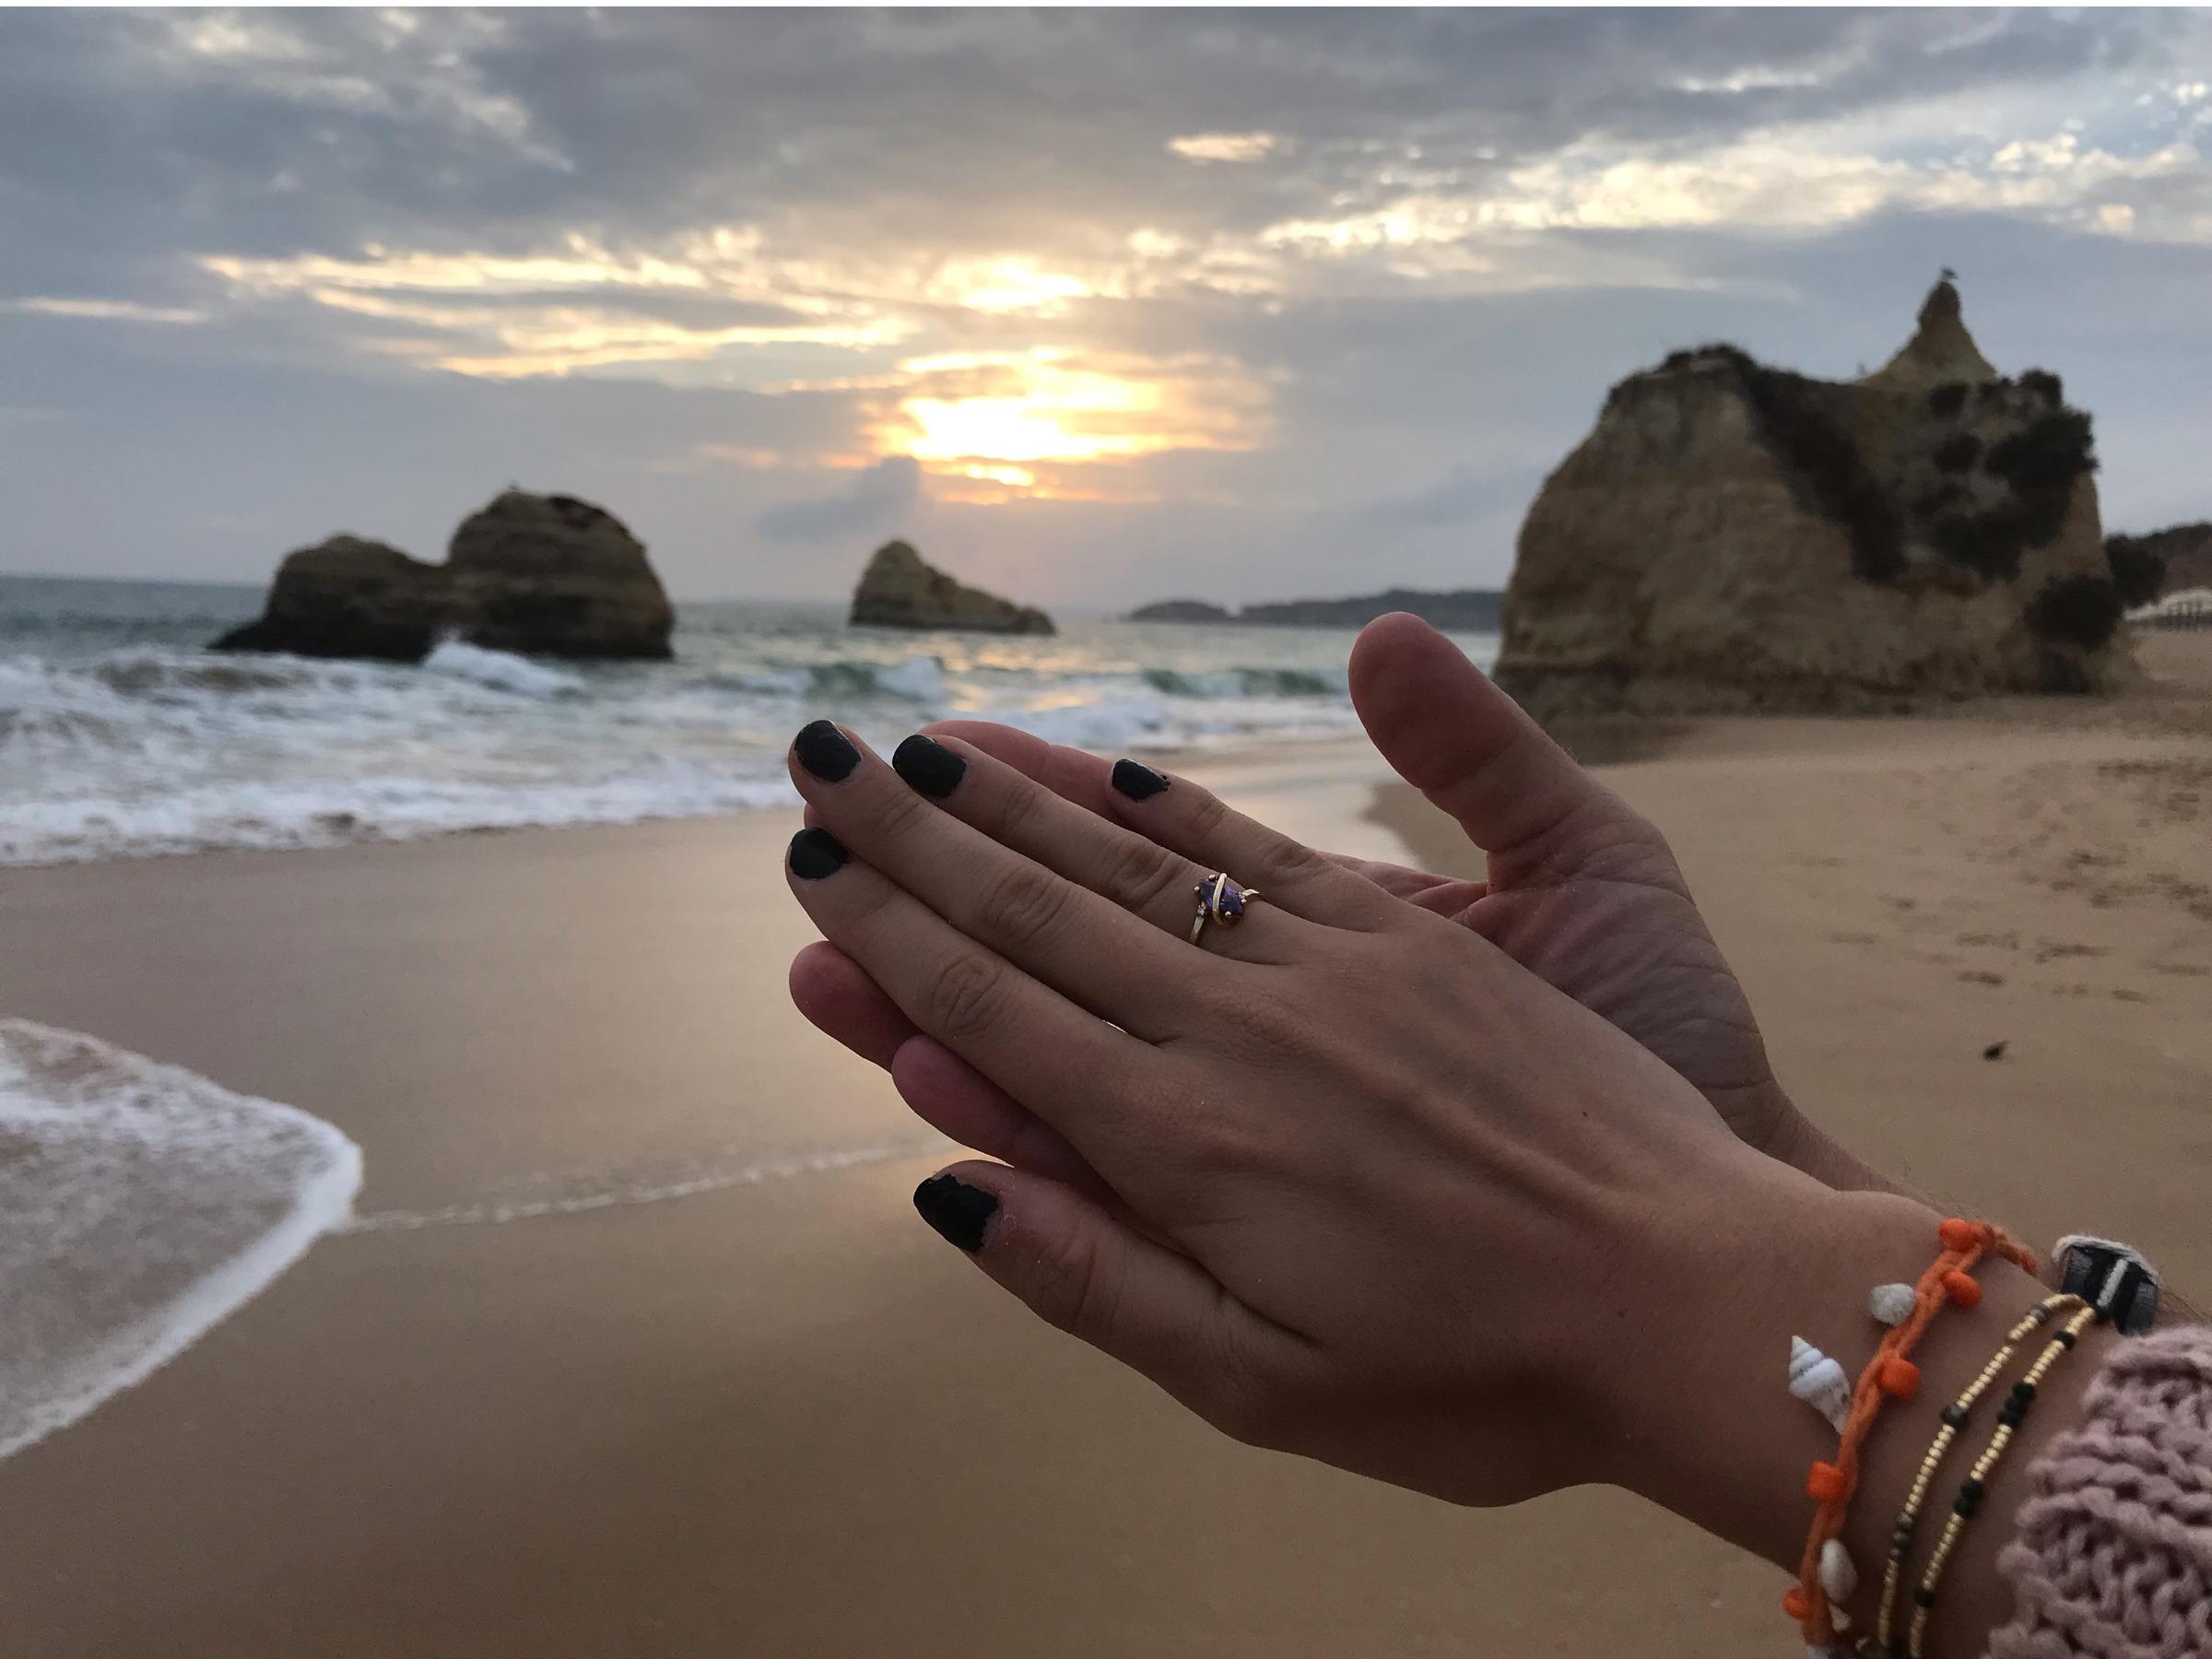 praia-da-rocha-alagarve-portugalia-o%C5%